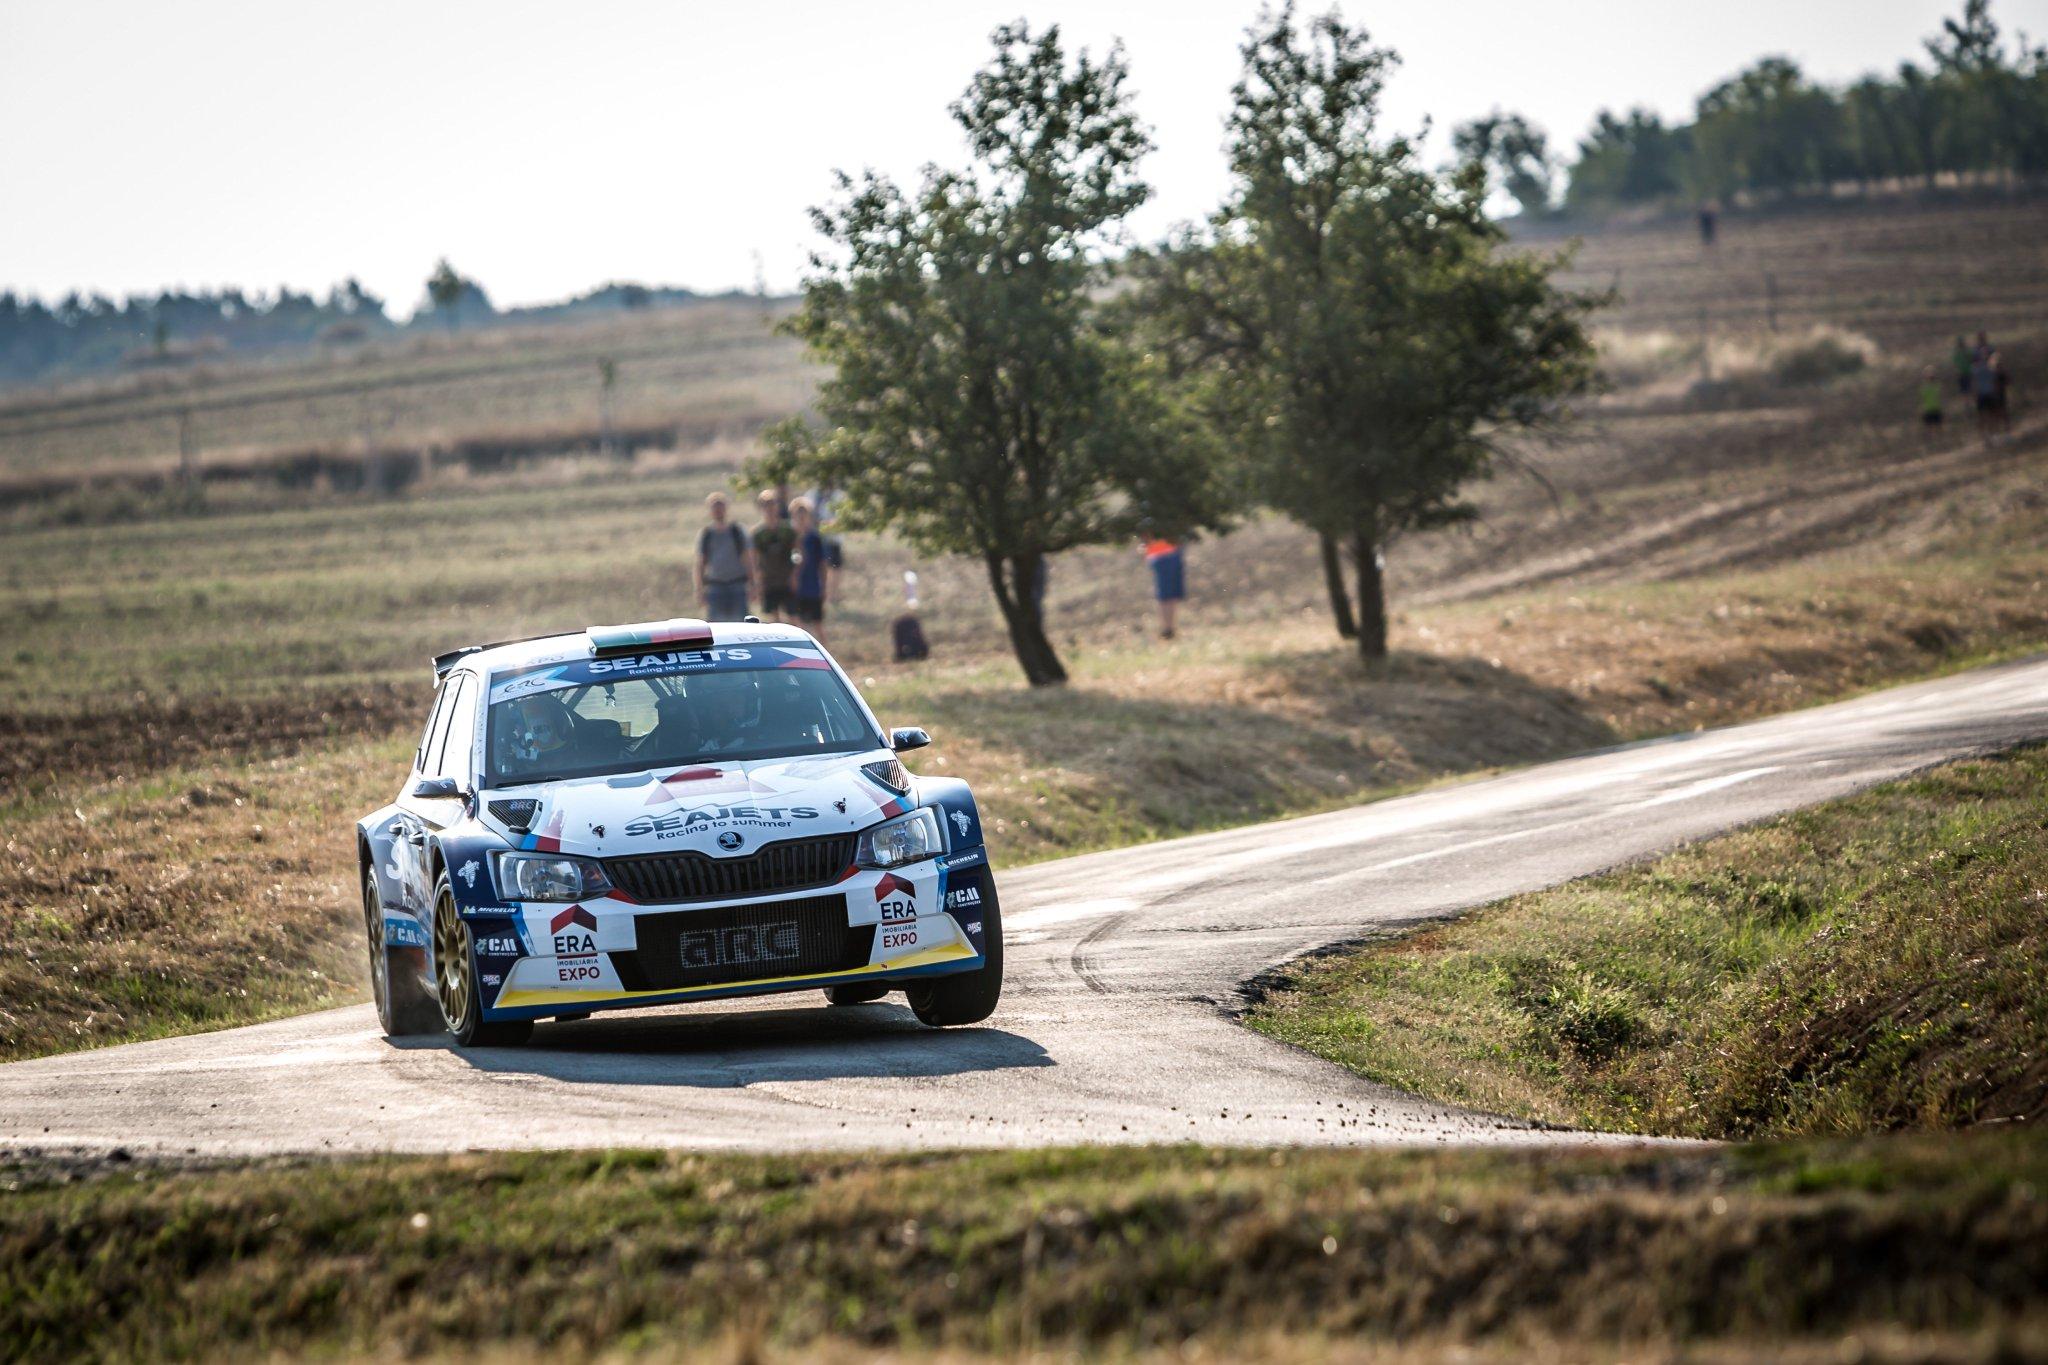 Rally Barum 2018 ERC - Página 3 Dlhk86SX0AAj-ij